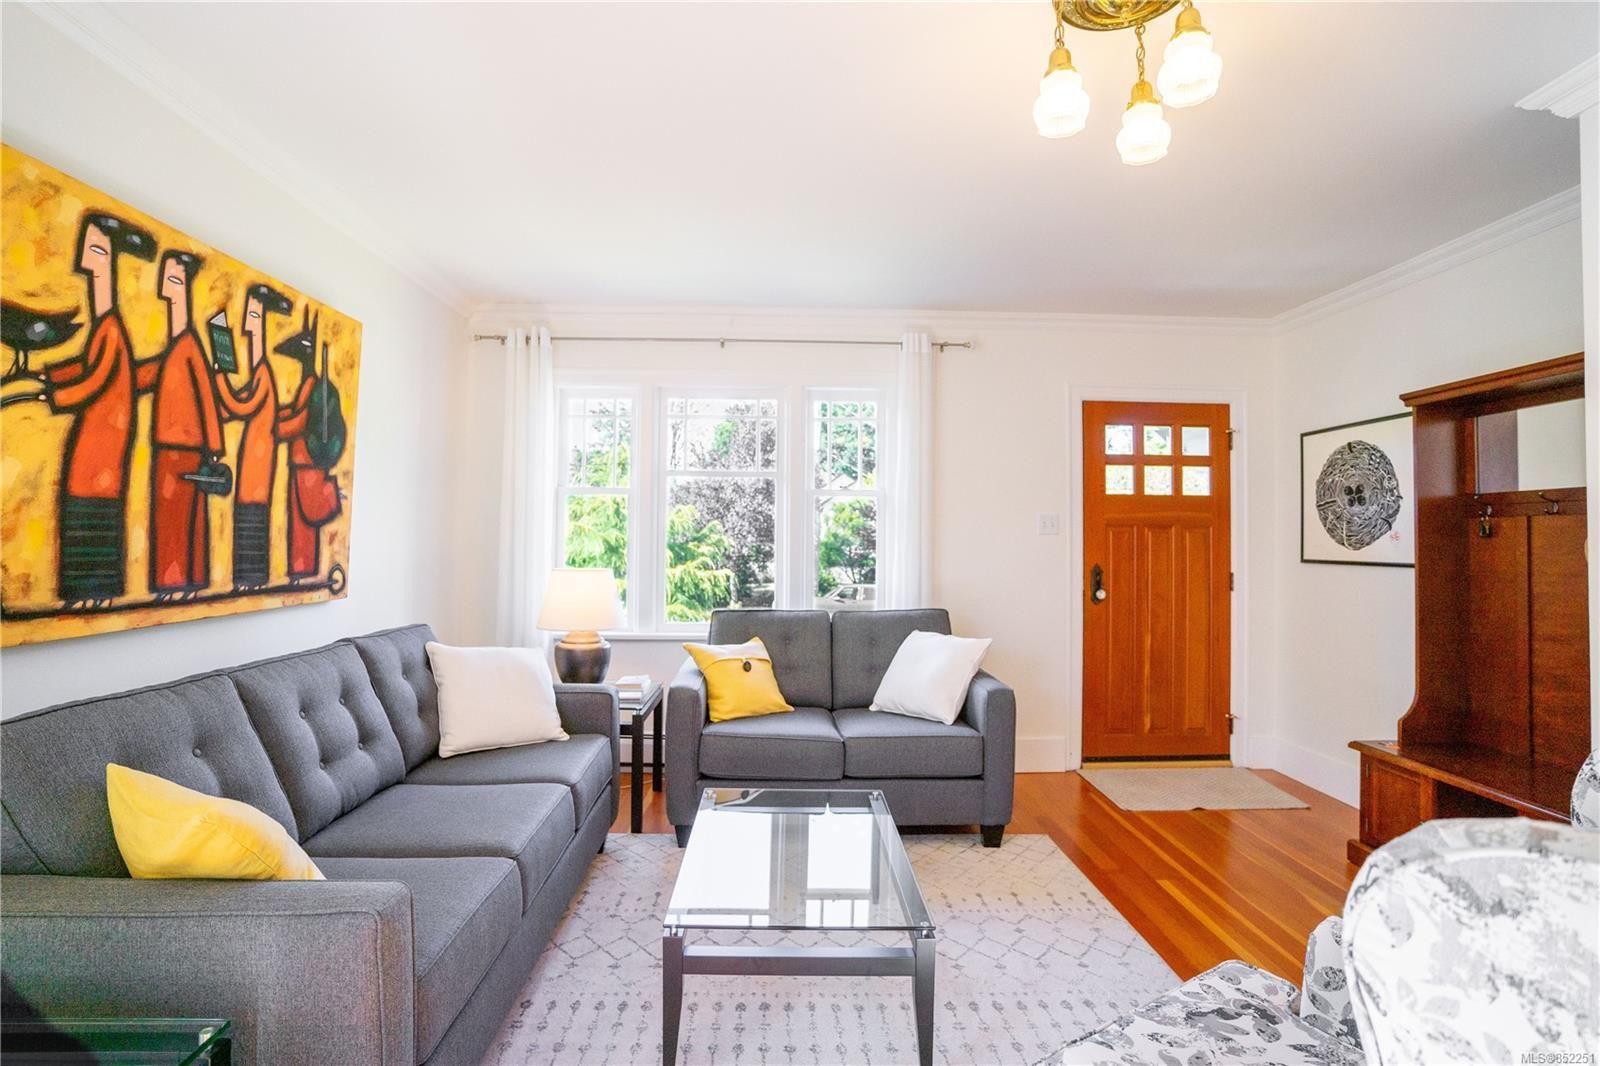 Photo 12: Photos: 2363 Pacific Ave in : OB Estevan House for sale (Oak Bay)  : MLS®# 852251